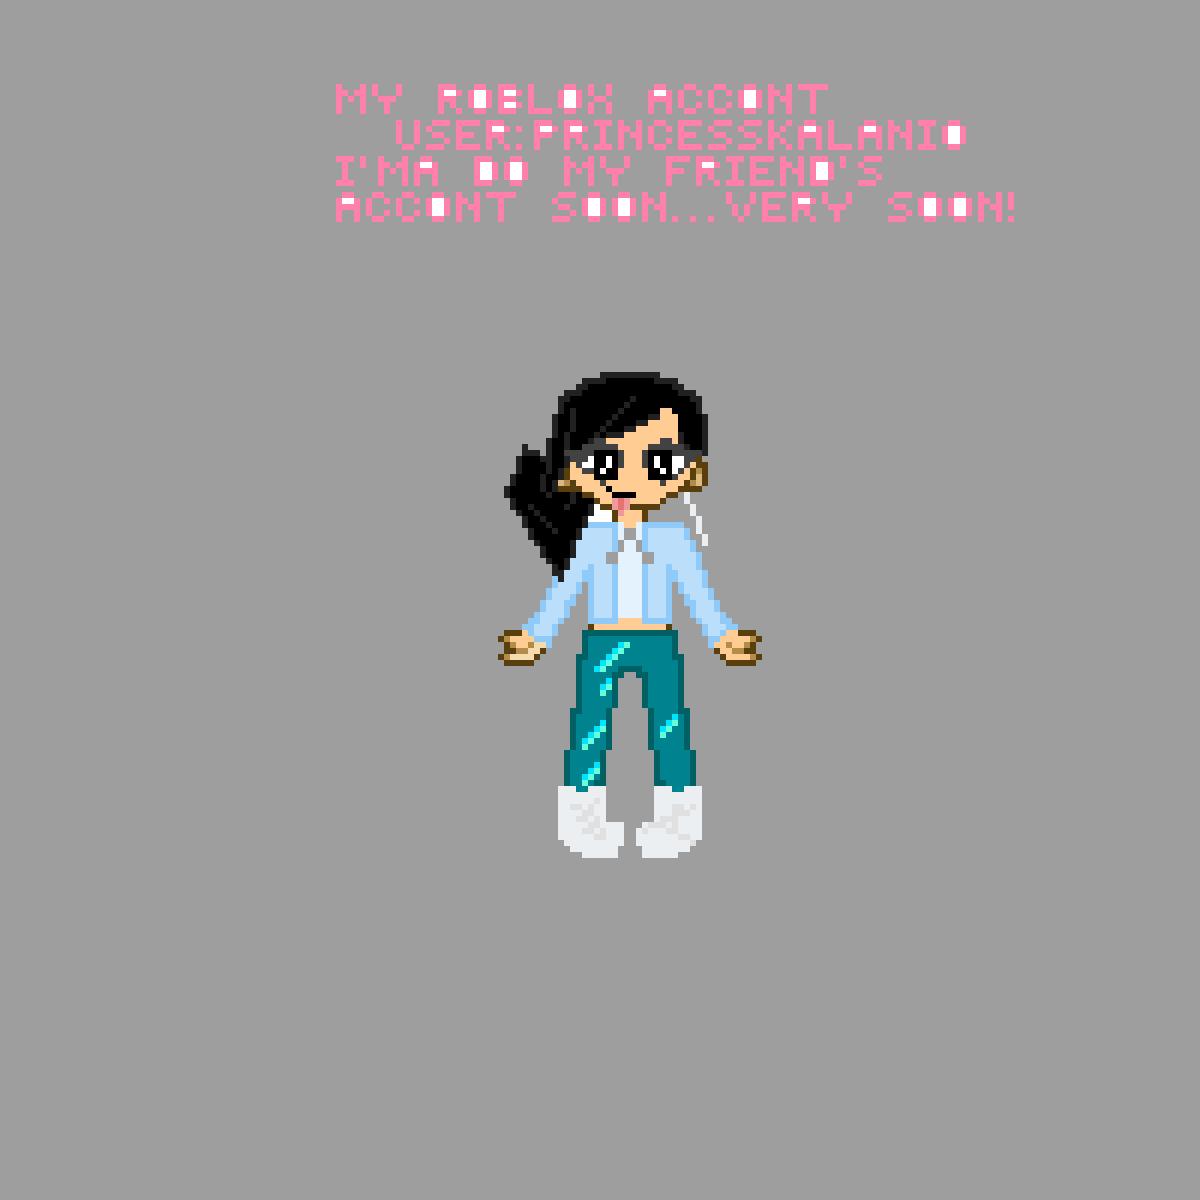 Pixilart - My Roblox Account: princesskalani0 by Anonymous